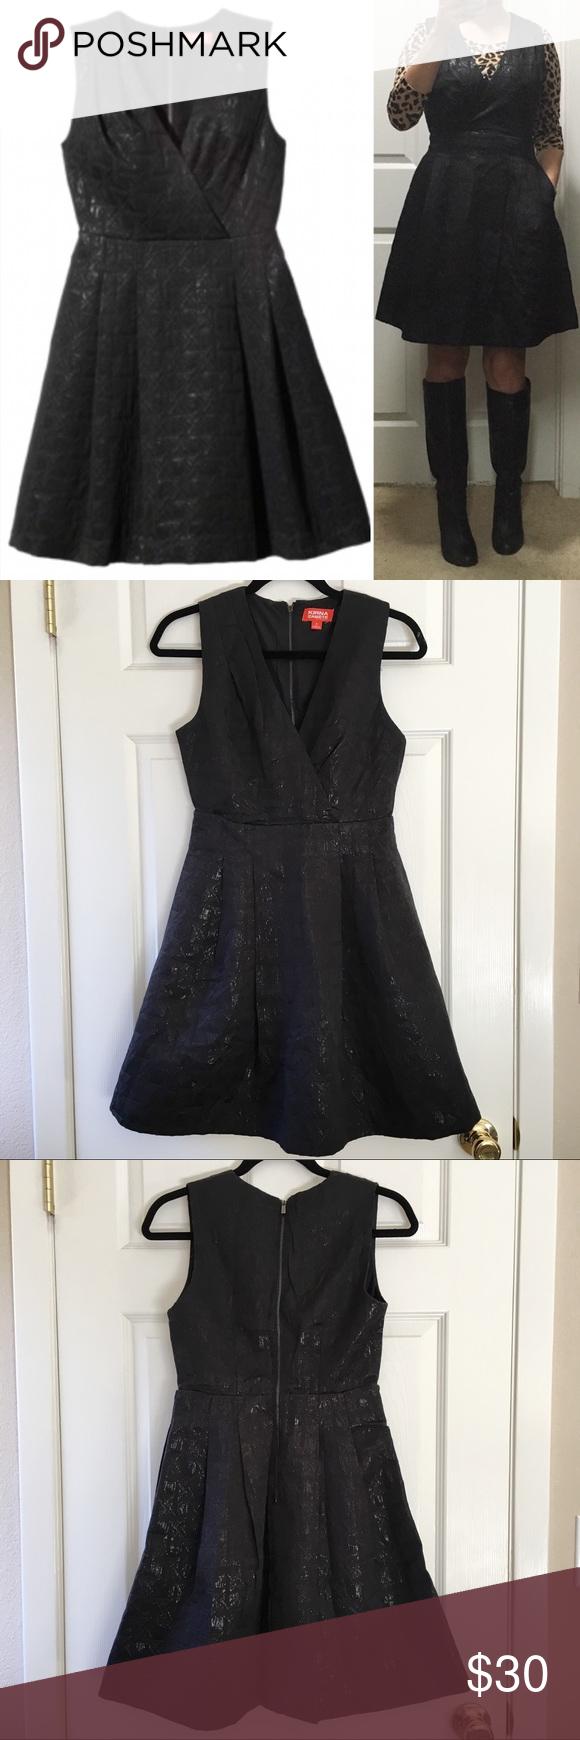 Kirna Zapete Little Black Dress Clothes Design Little Black Dress Dresses [ 1740 x 580 Pixel ]